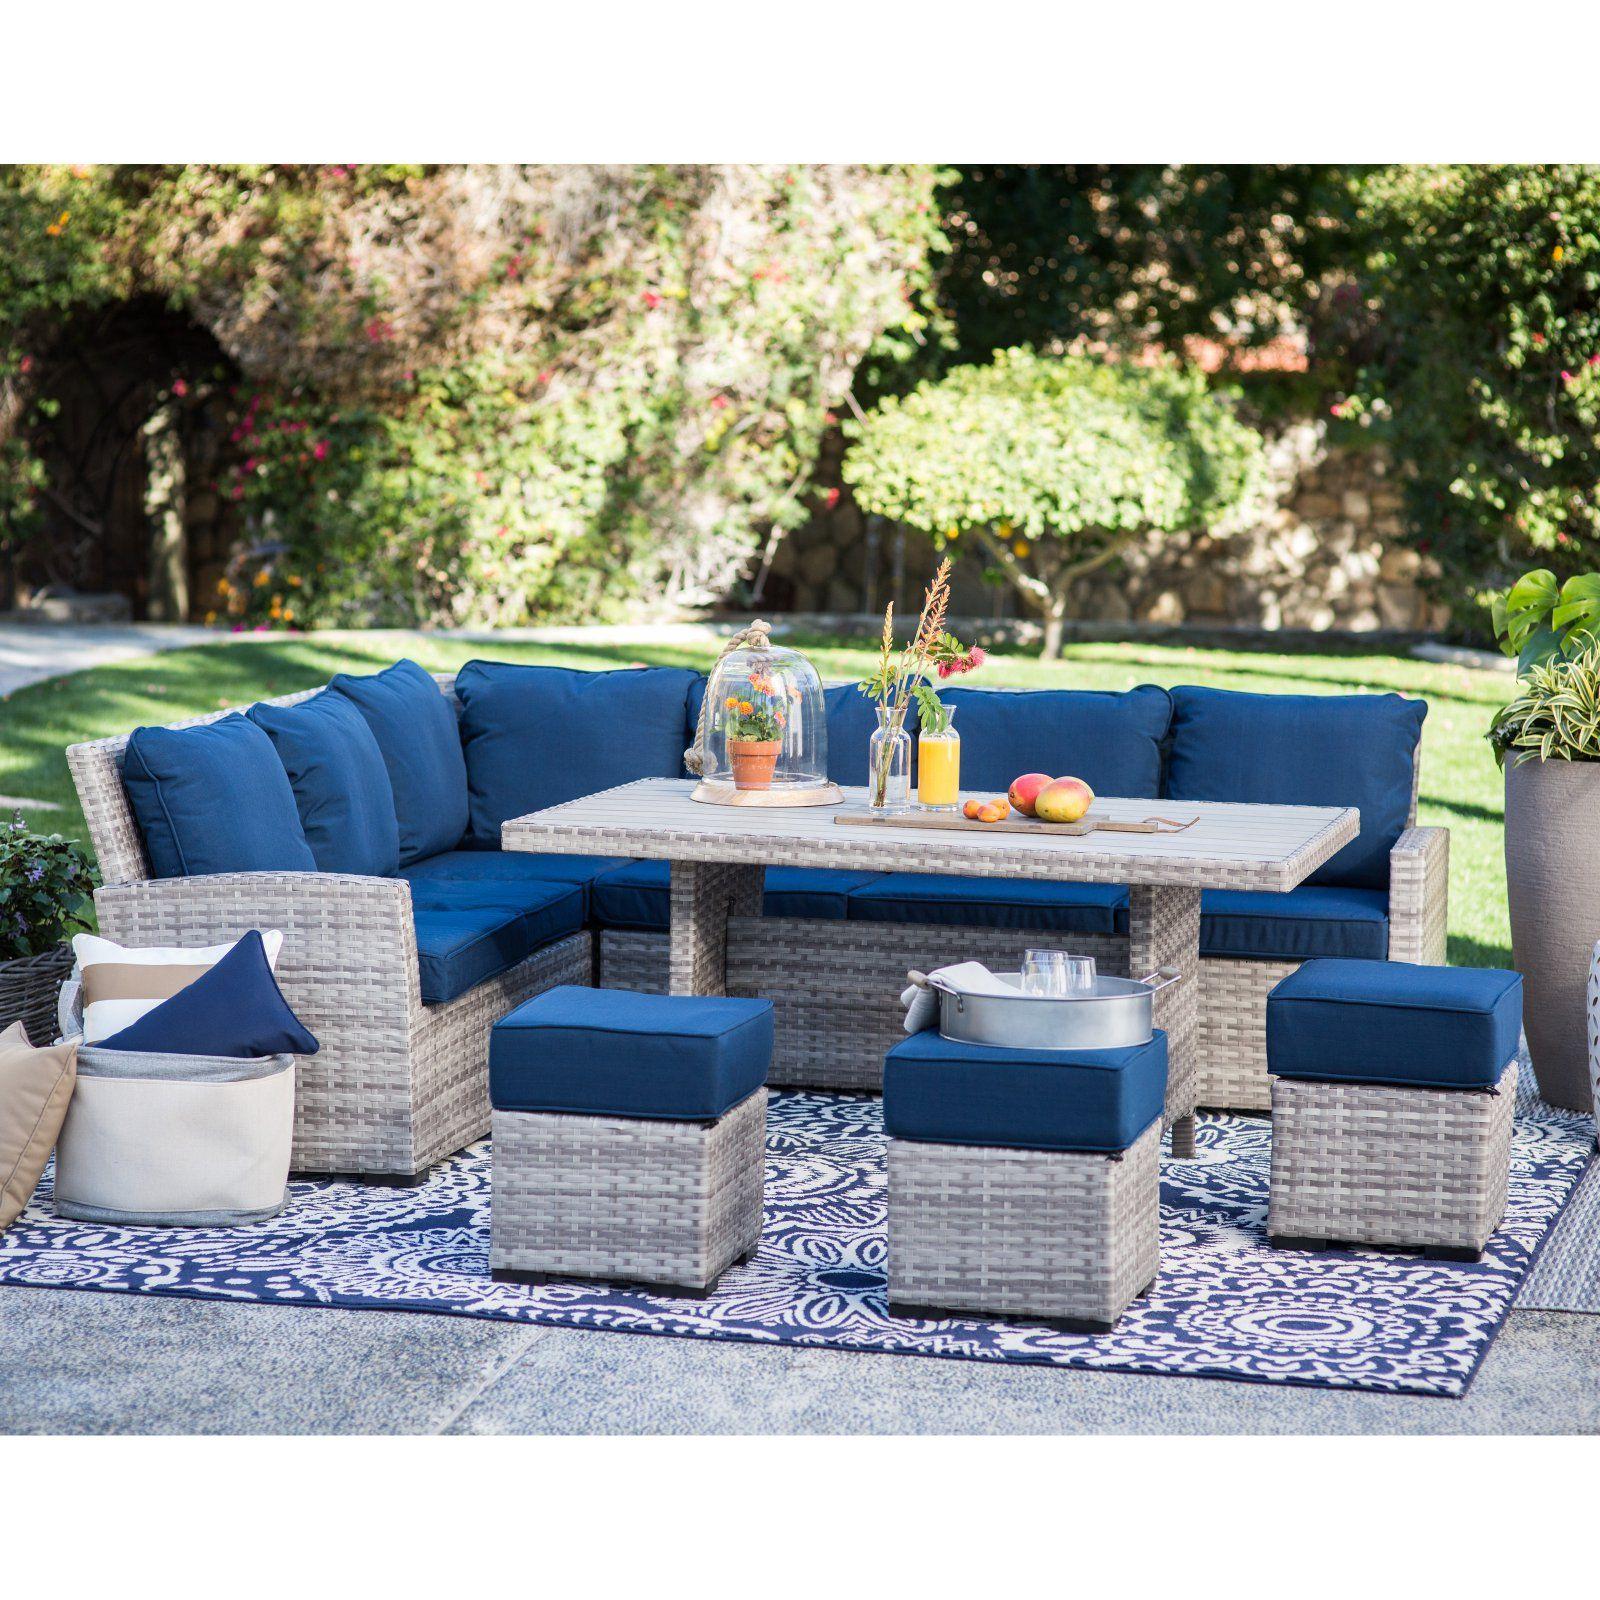 Patio Garden Dining Furniture